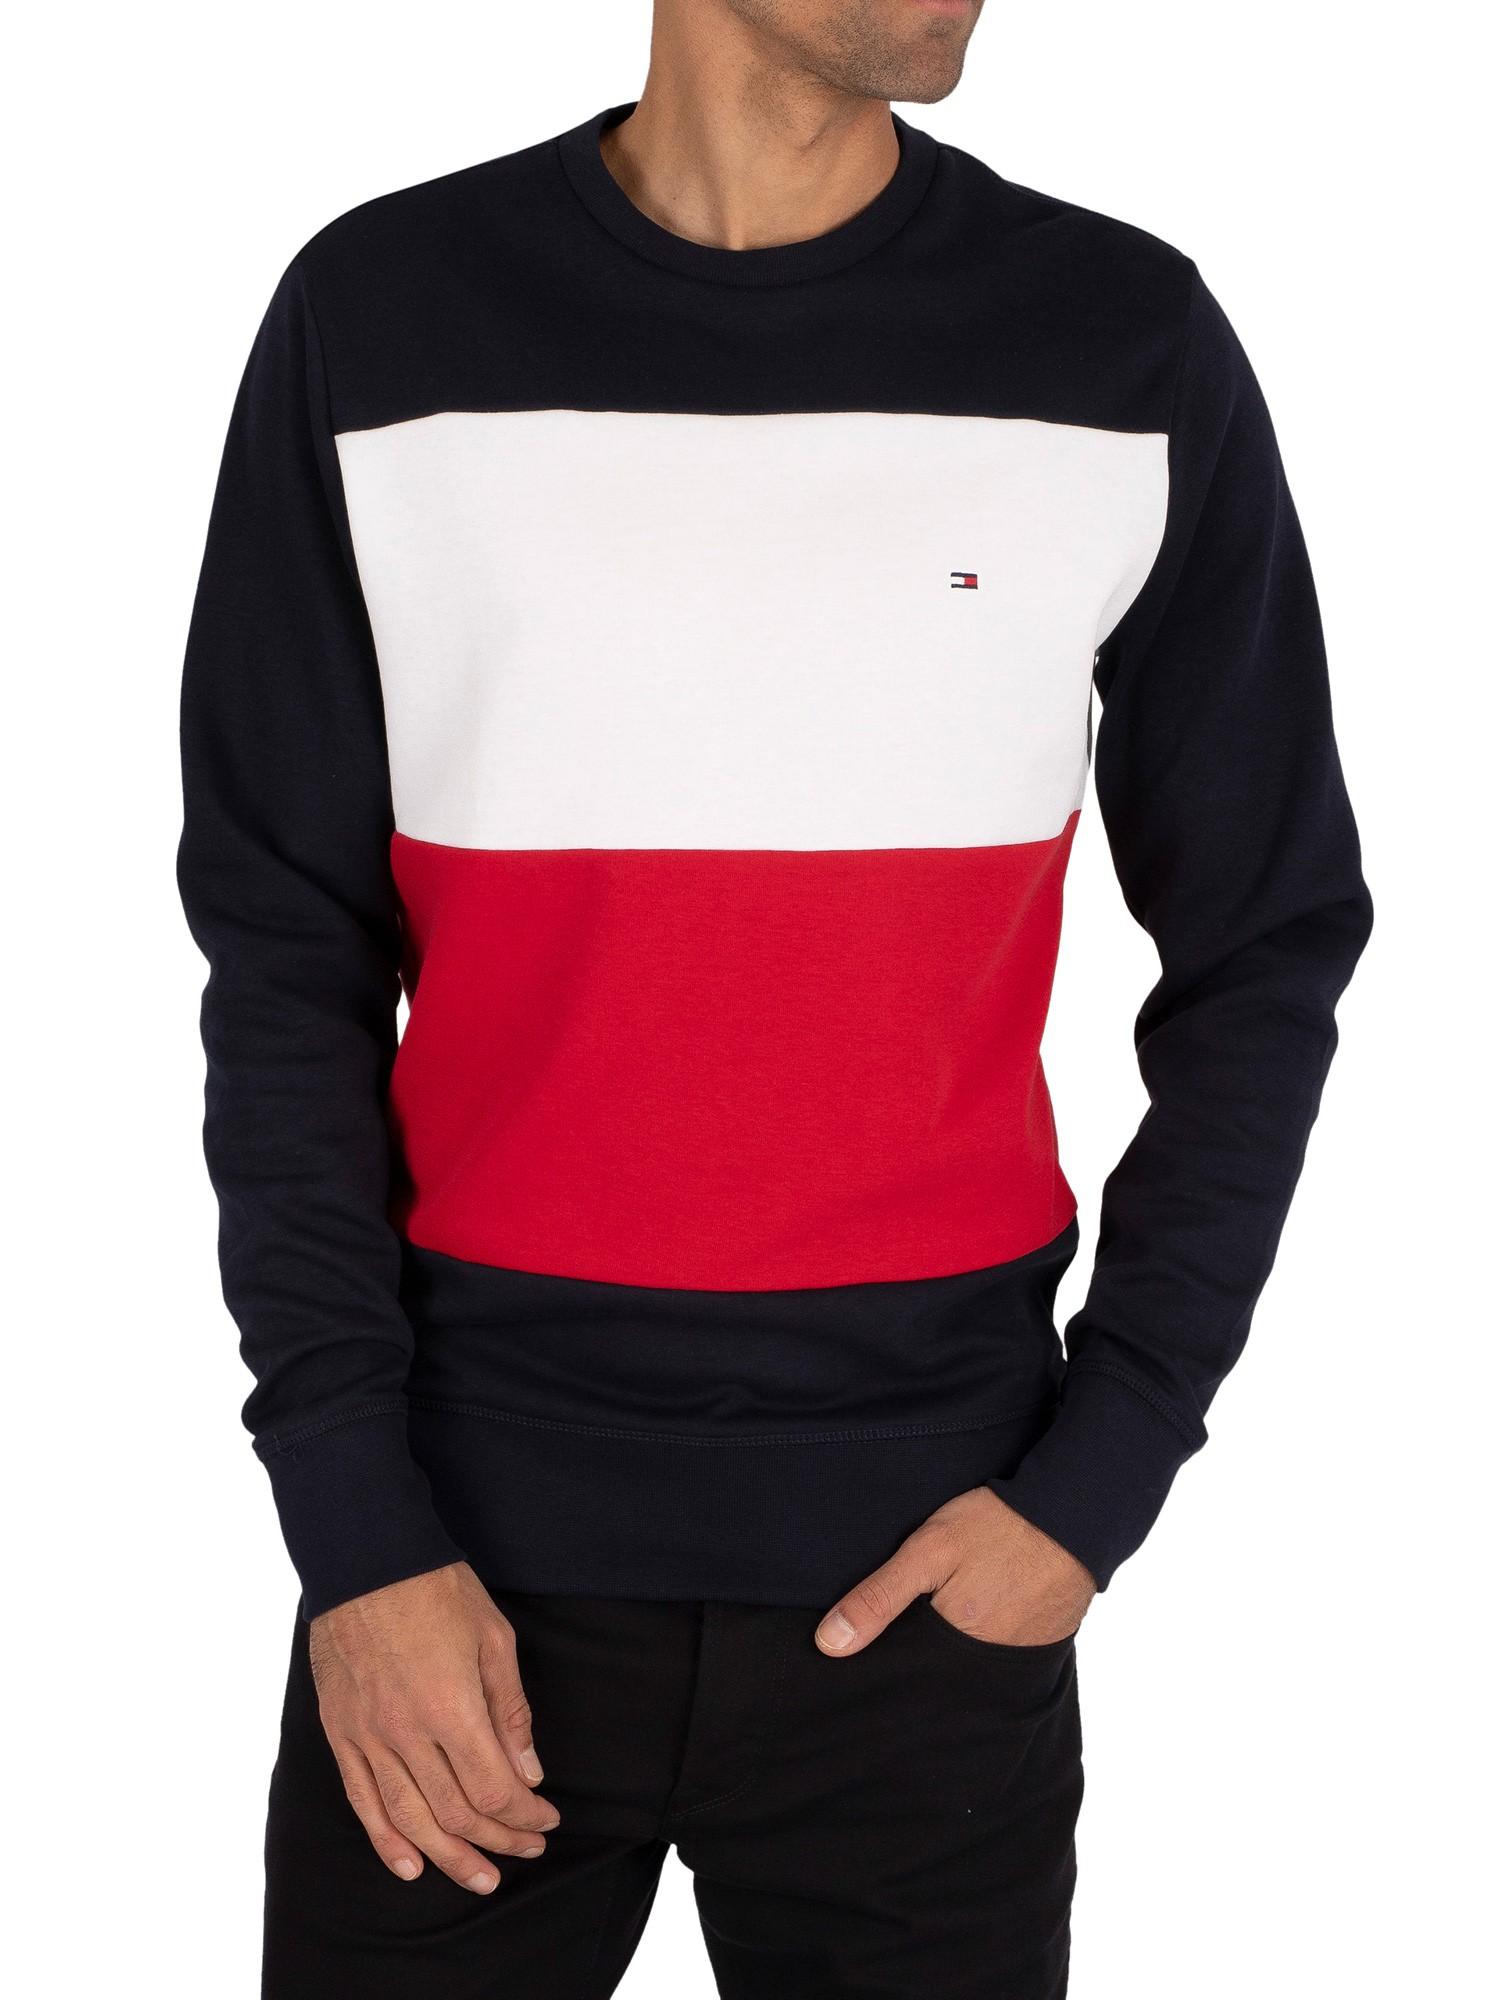 Multicoloured Tommy Hilfiger Men/'s Colourblock Sweatshirt